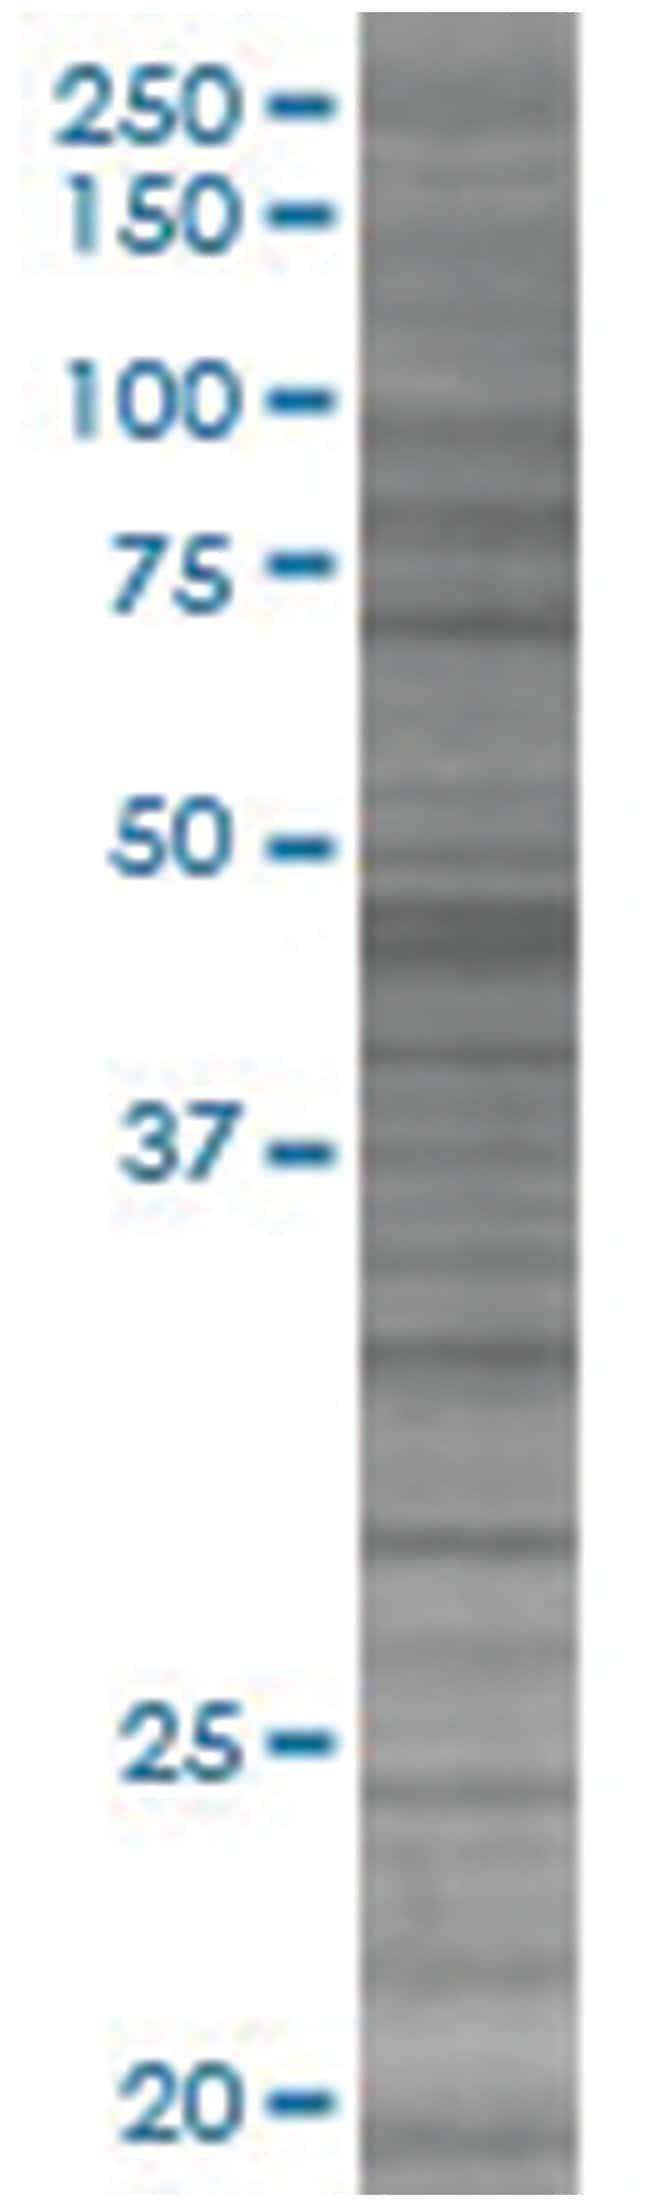 ZNF394 293T Cell Overexpression Lysate (Denatured), Abnova 100µL:Life